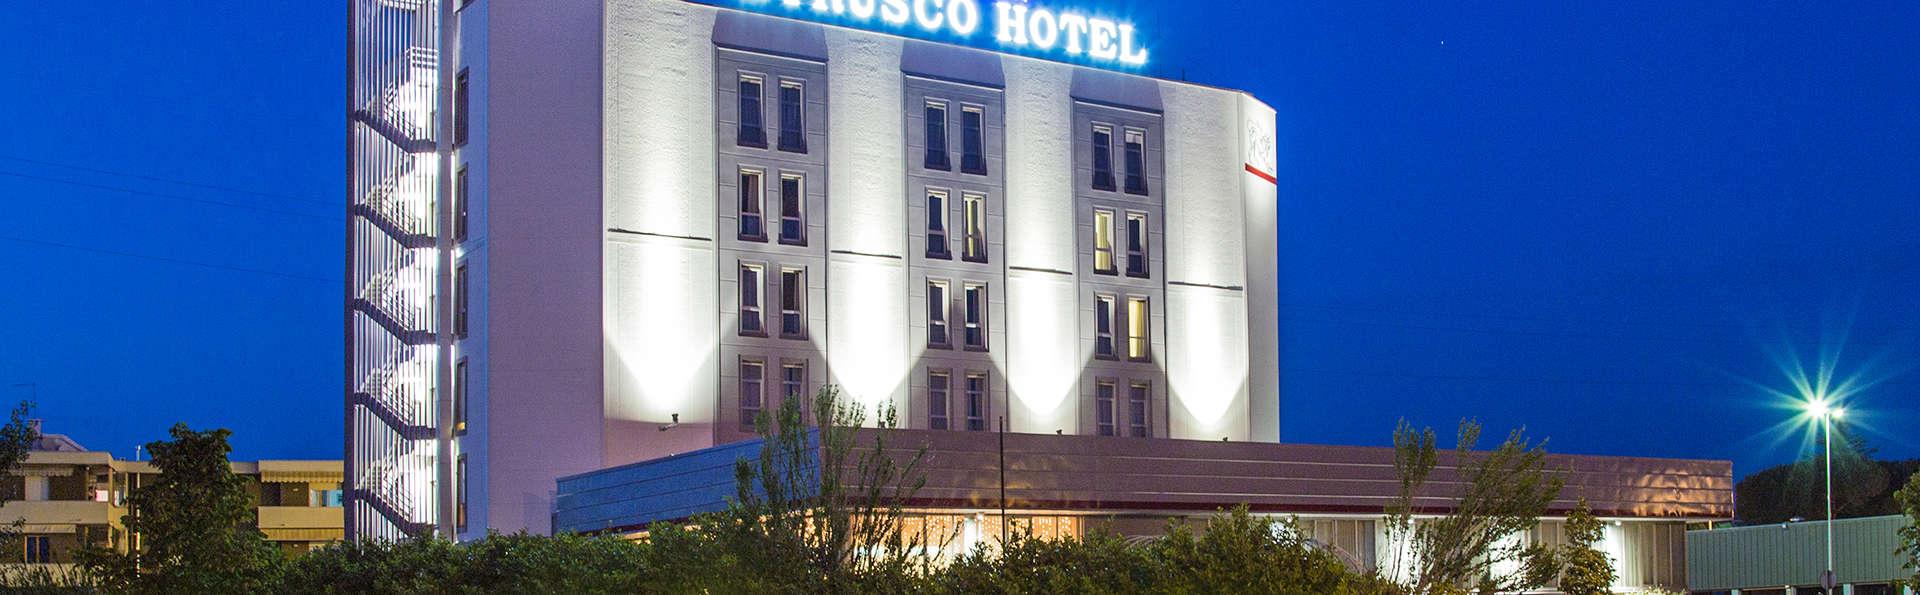 Etrusco Arezzo Hotel - Edit_front2.jpg